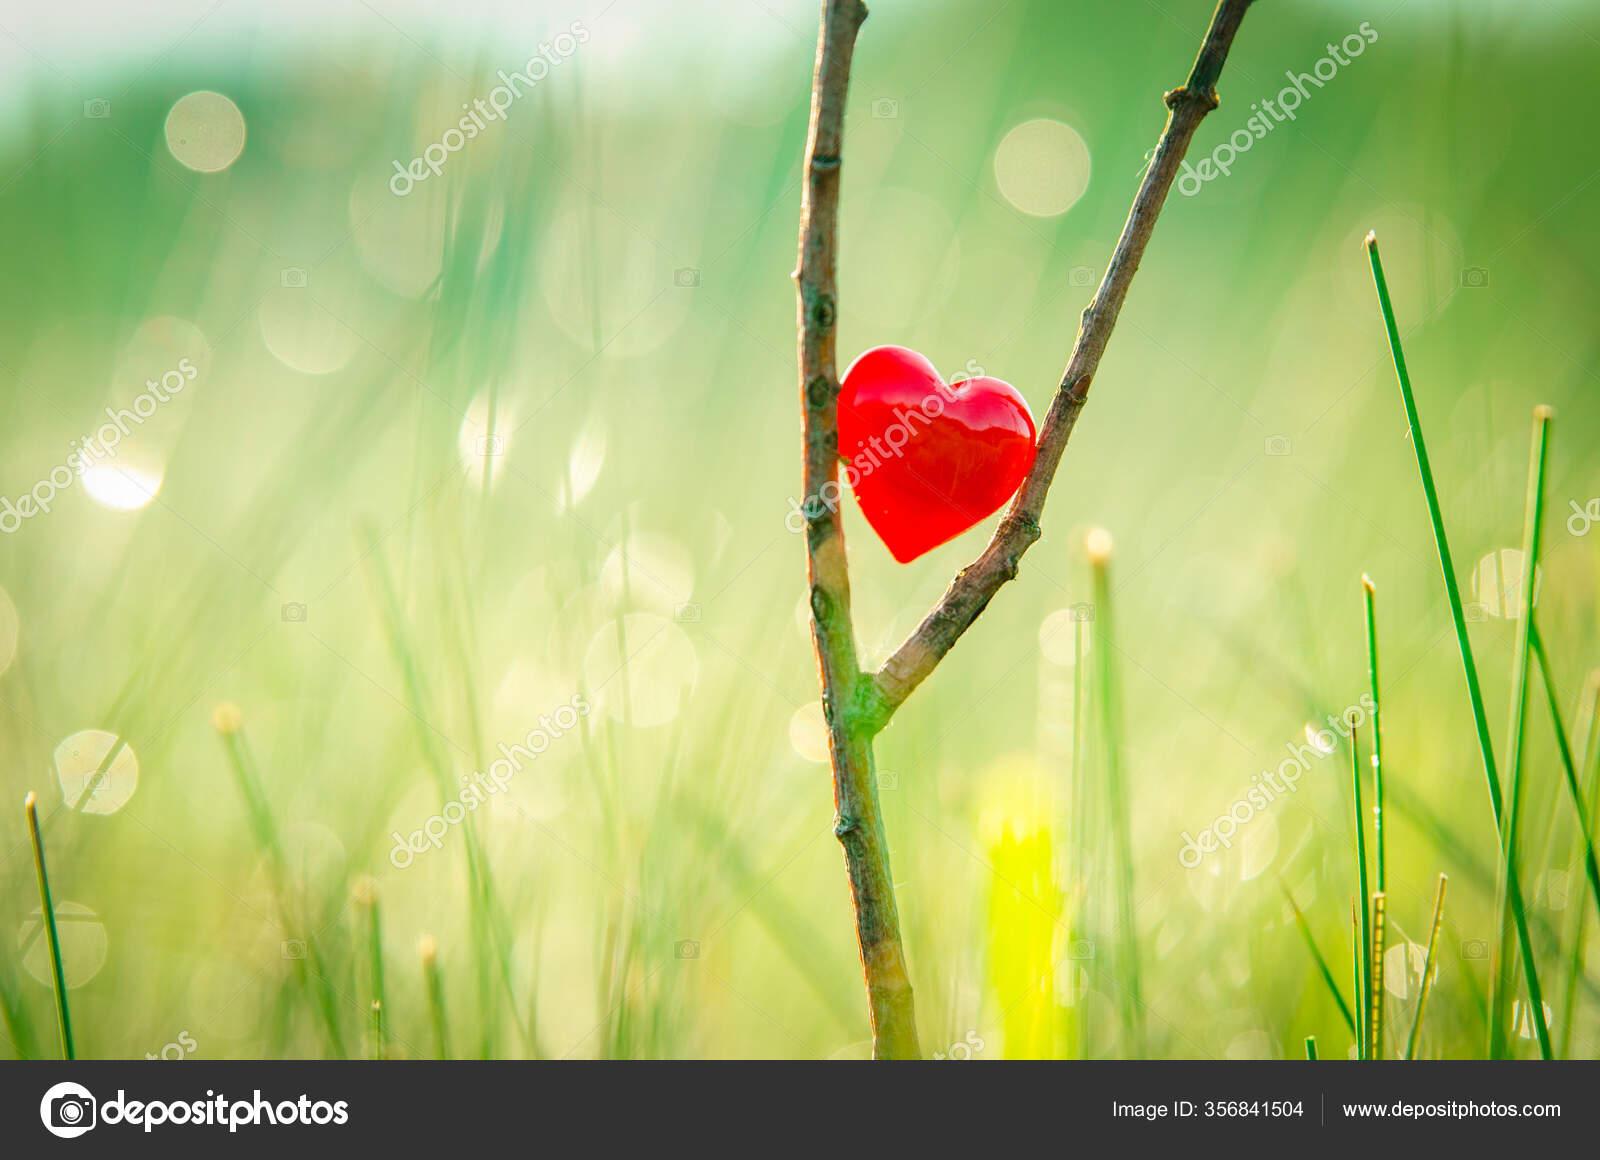 Red Heart Nature Wonderful Morning Drops Background Beautiful Light Original Stock Photo Image By C Kovop58 Gmail Com 356841504